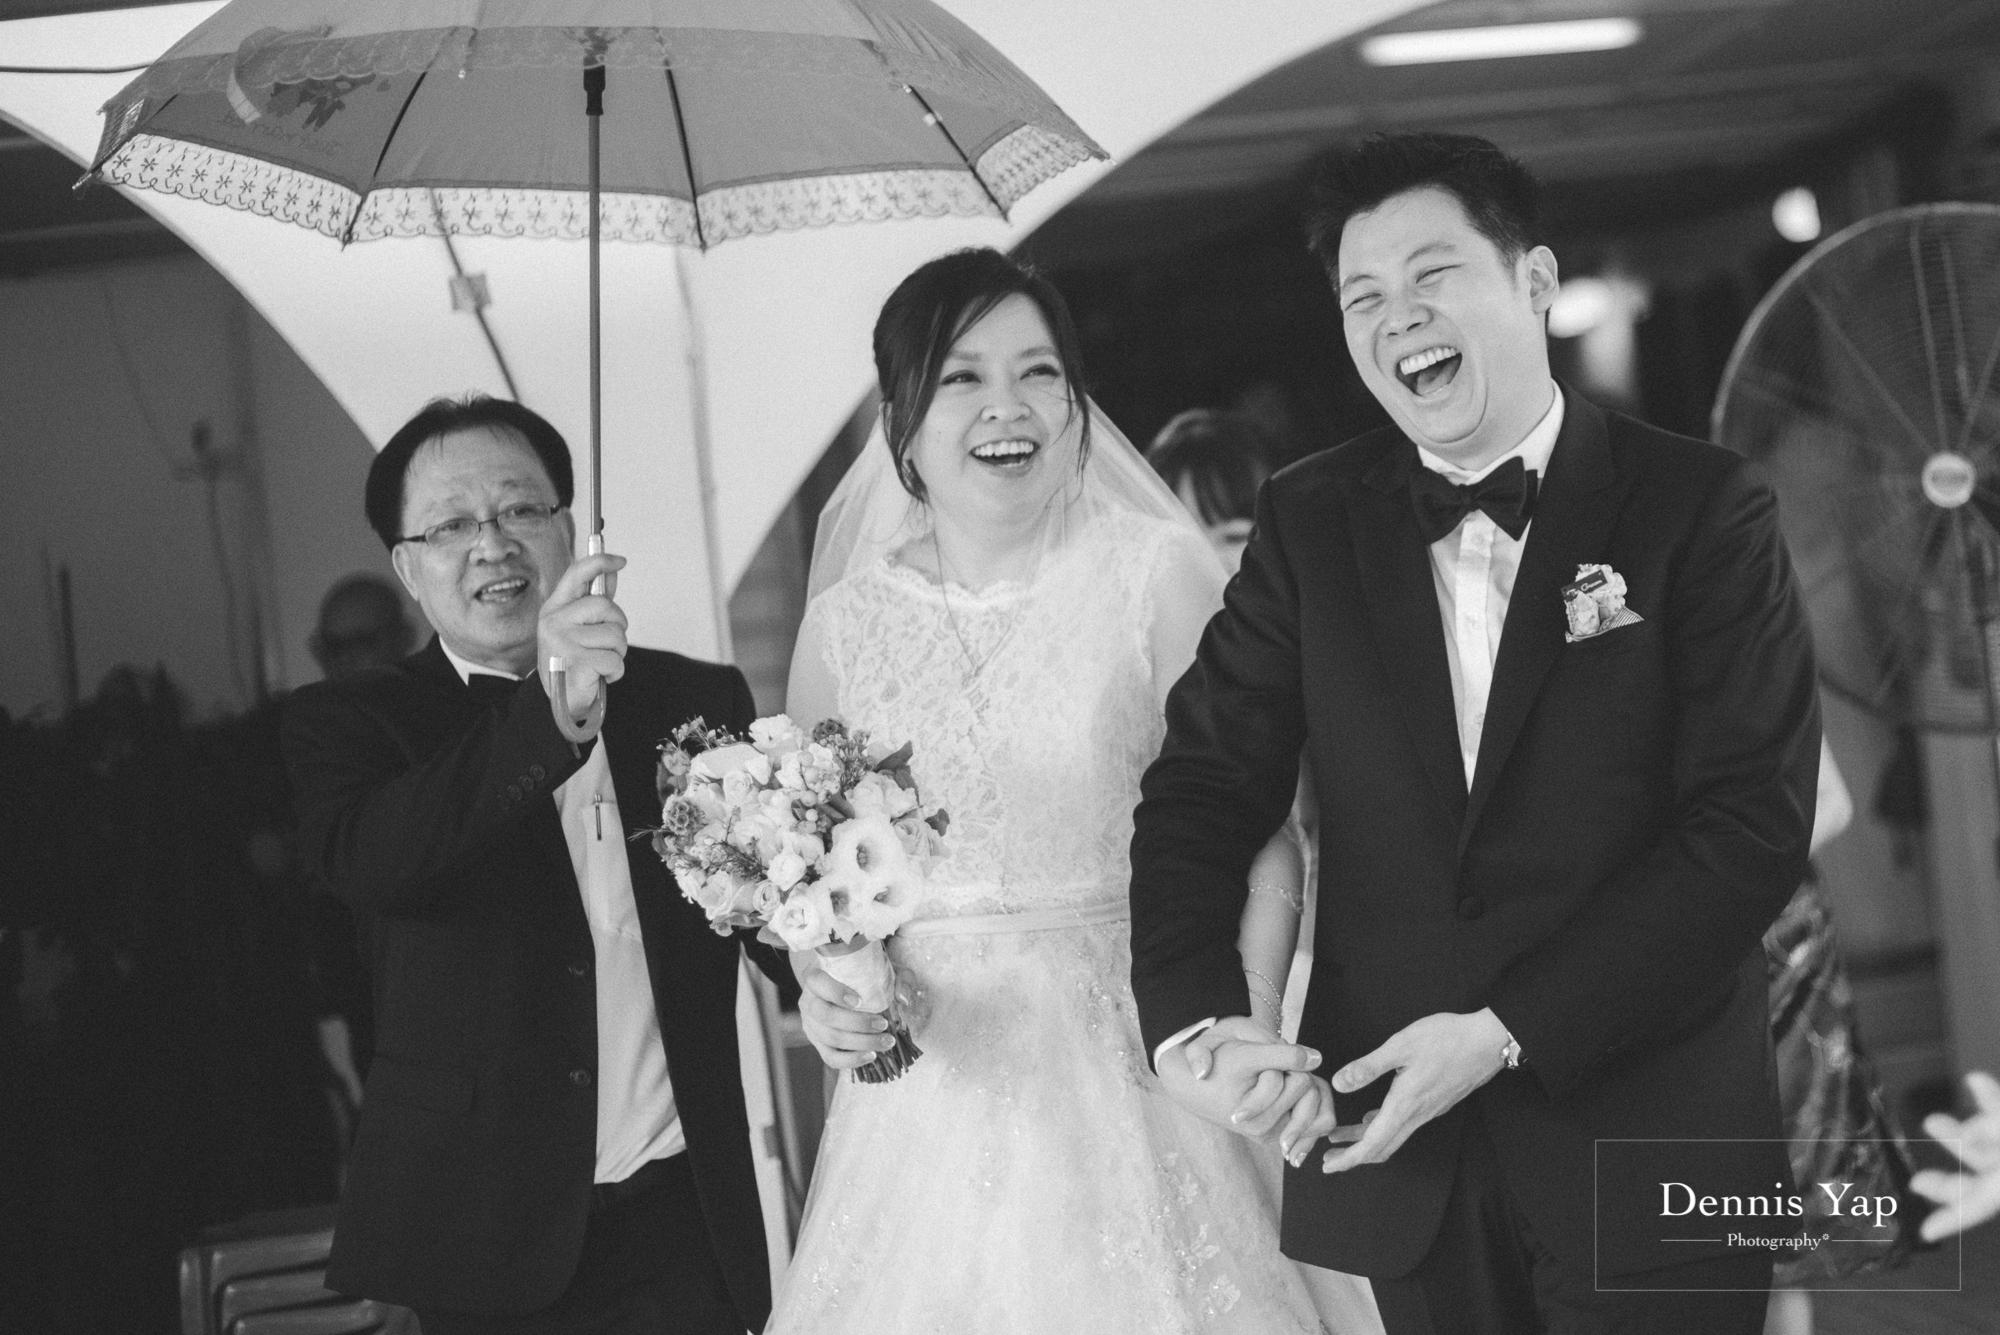 ino sheri black white church wedding st thomas more subang jaya dennis yap photography touching love beloved australia indonesia-21.jpg